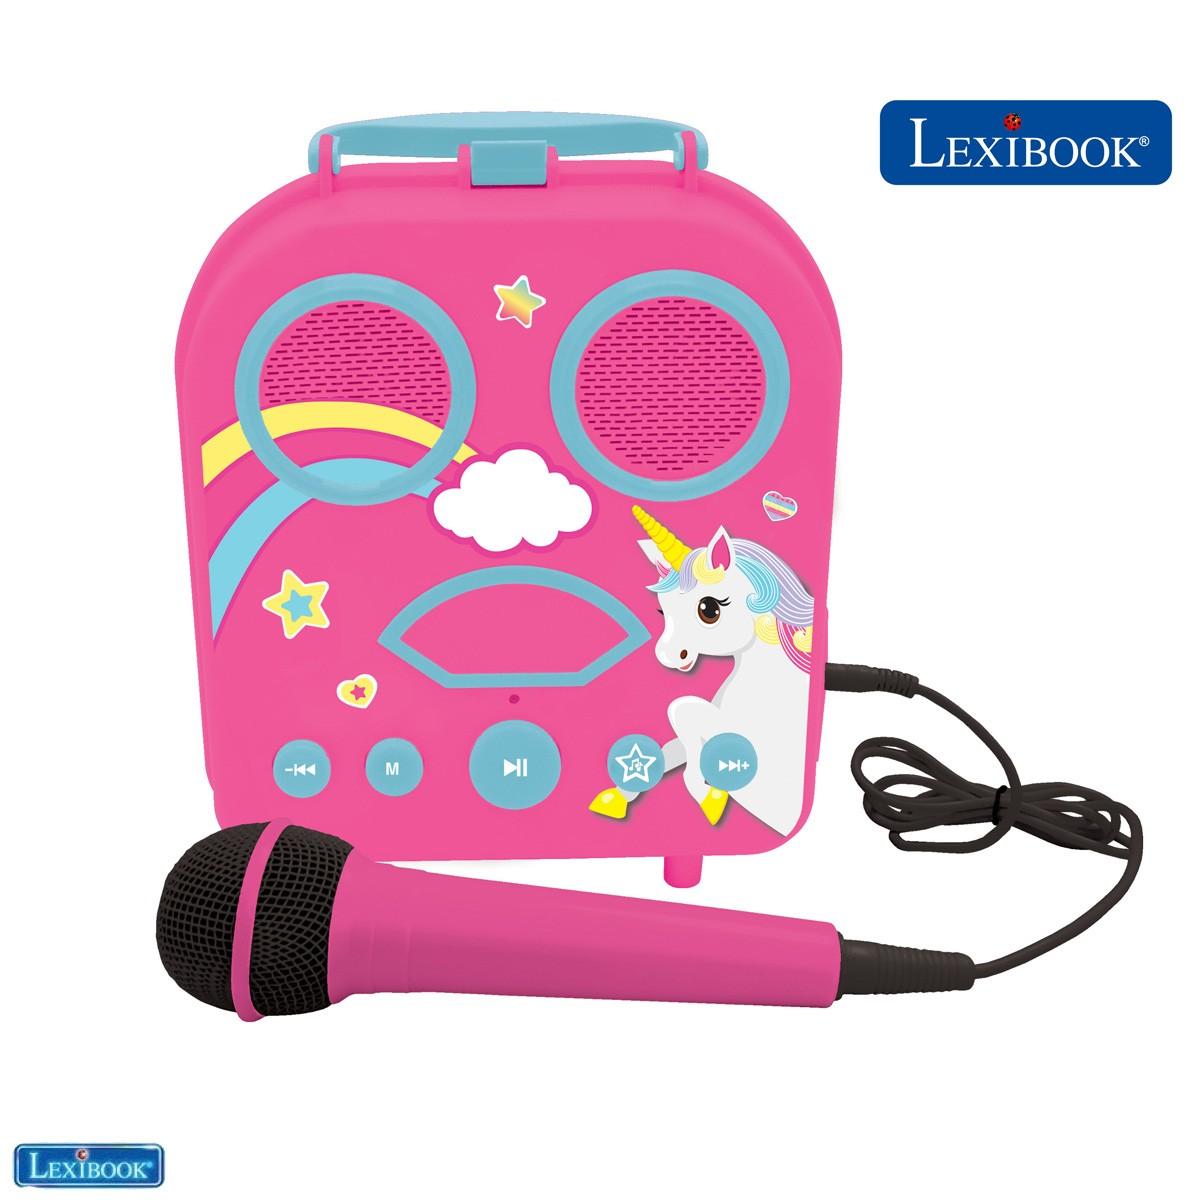 Portable karaoke with Microphone